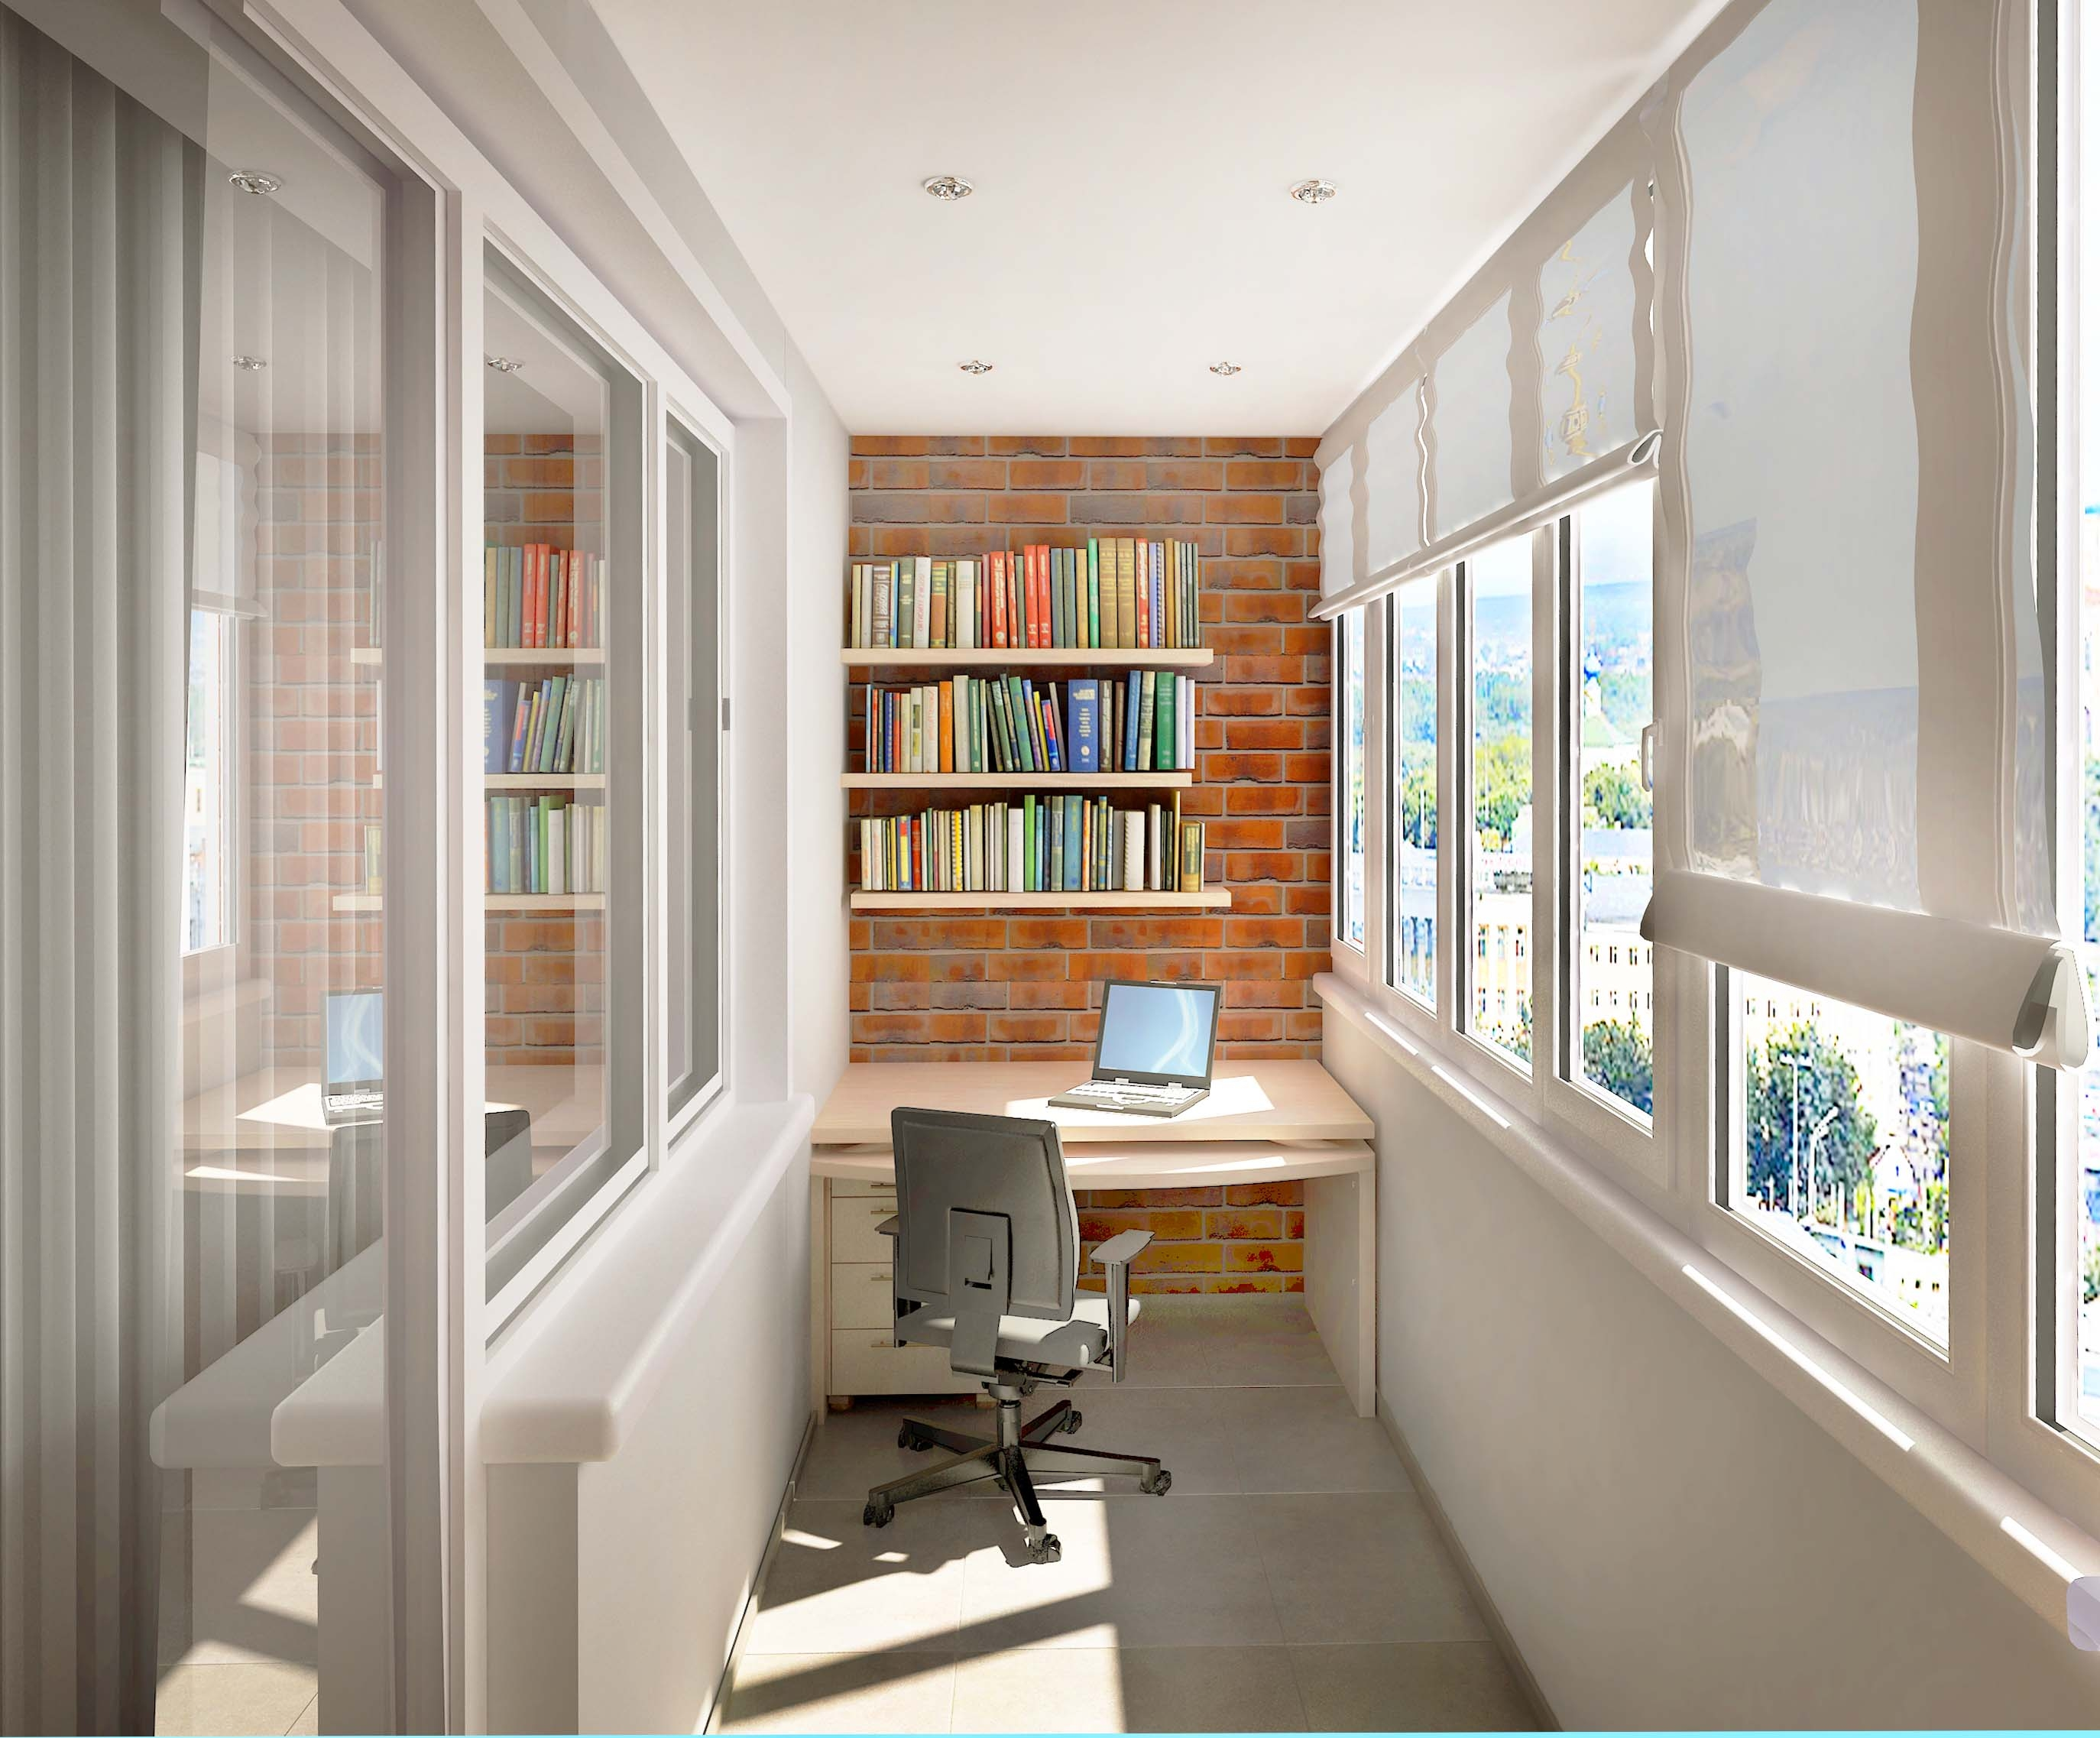 кабинет на балконе интерьер фото